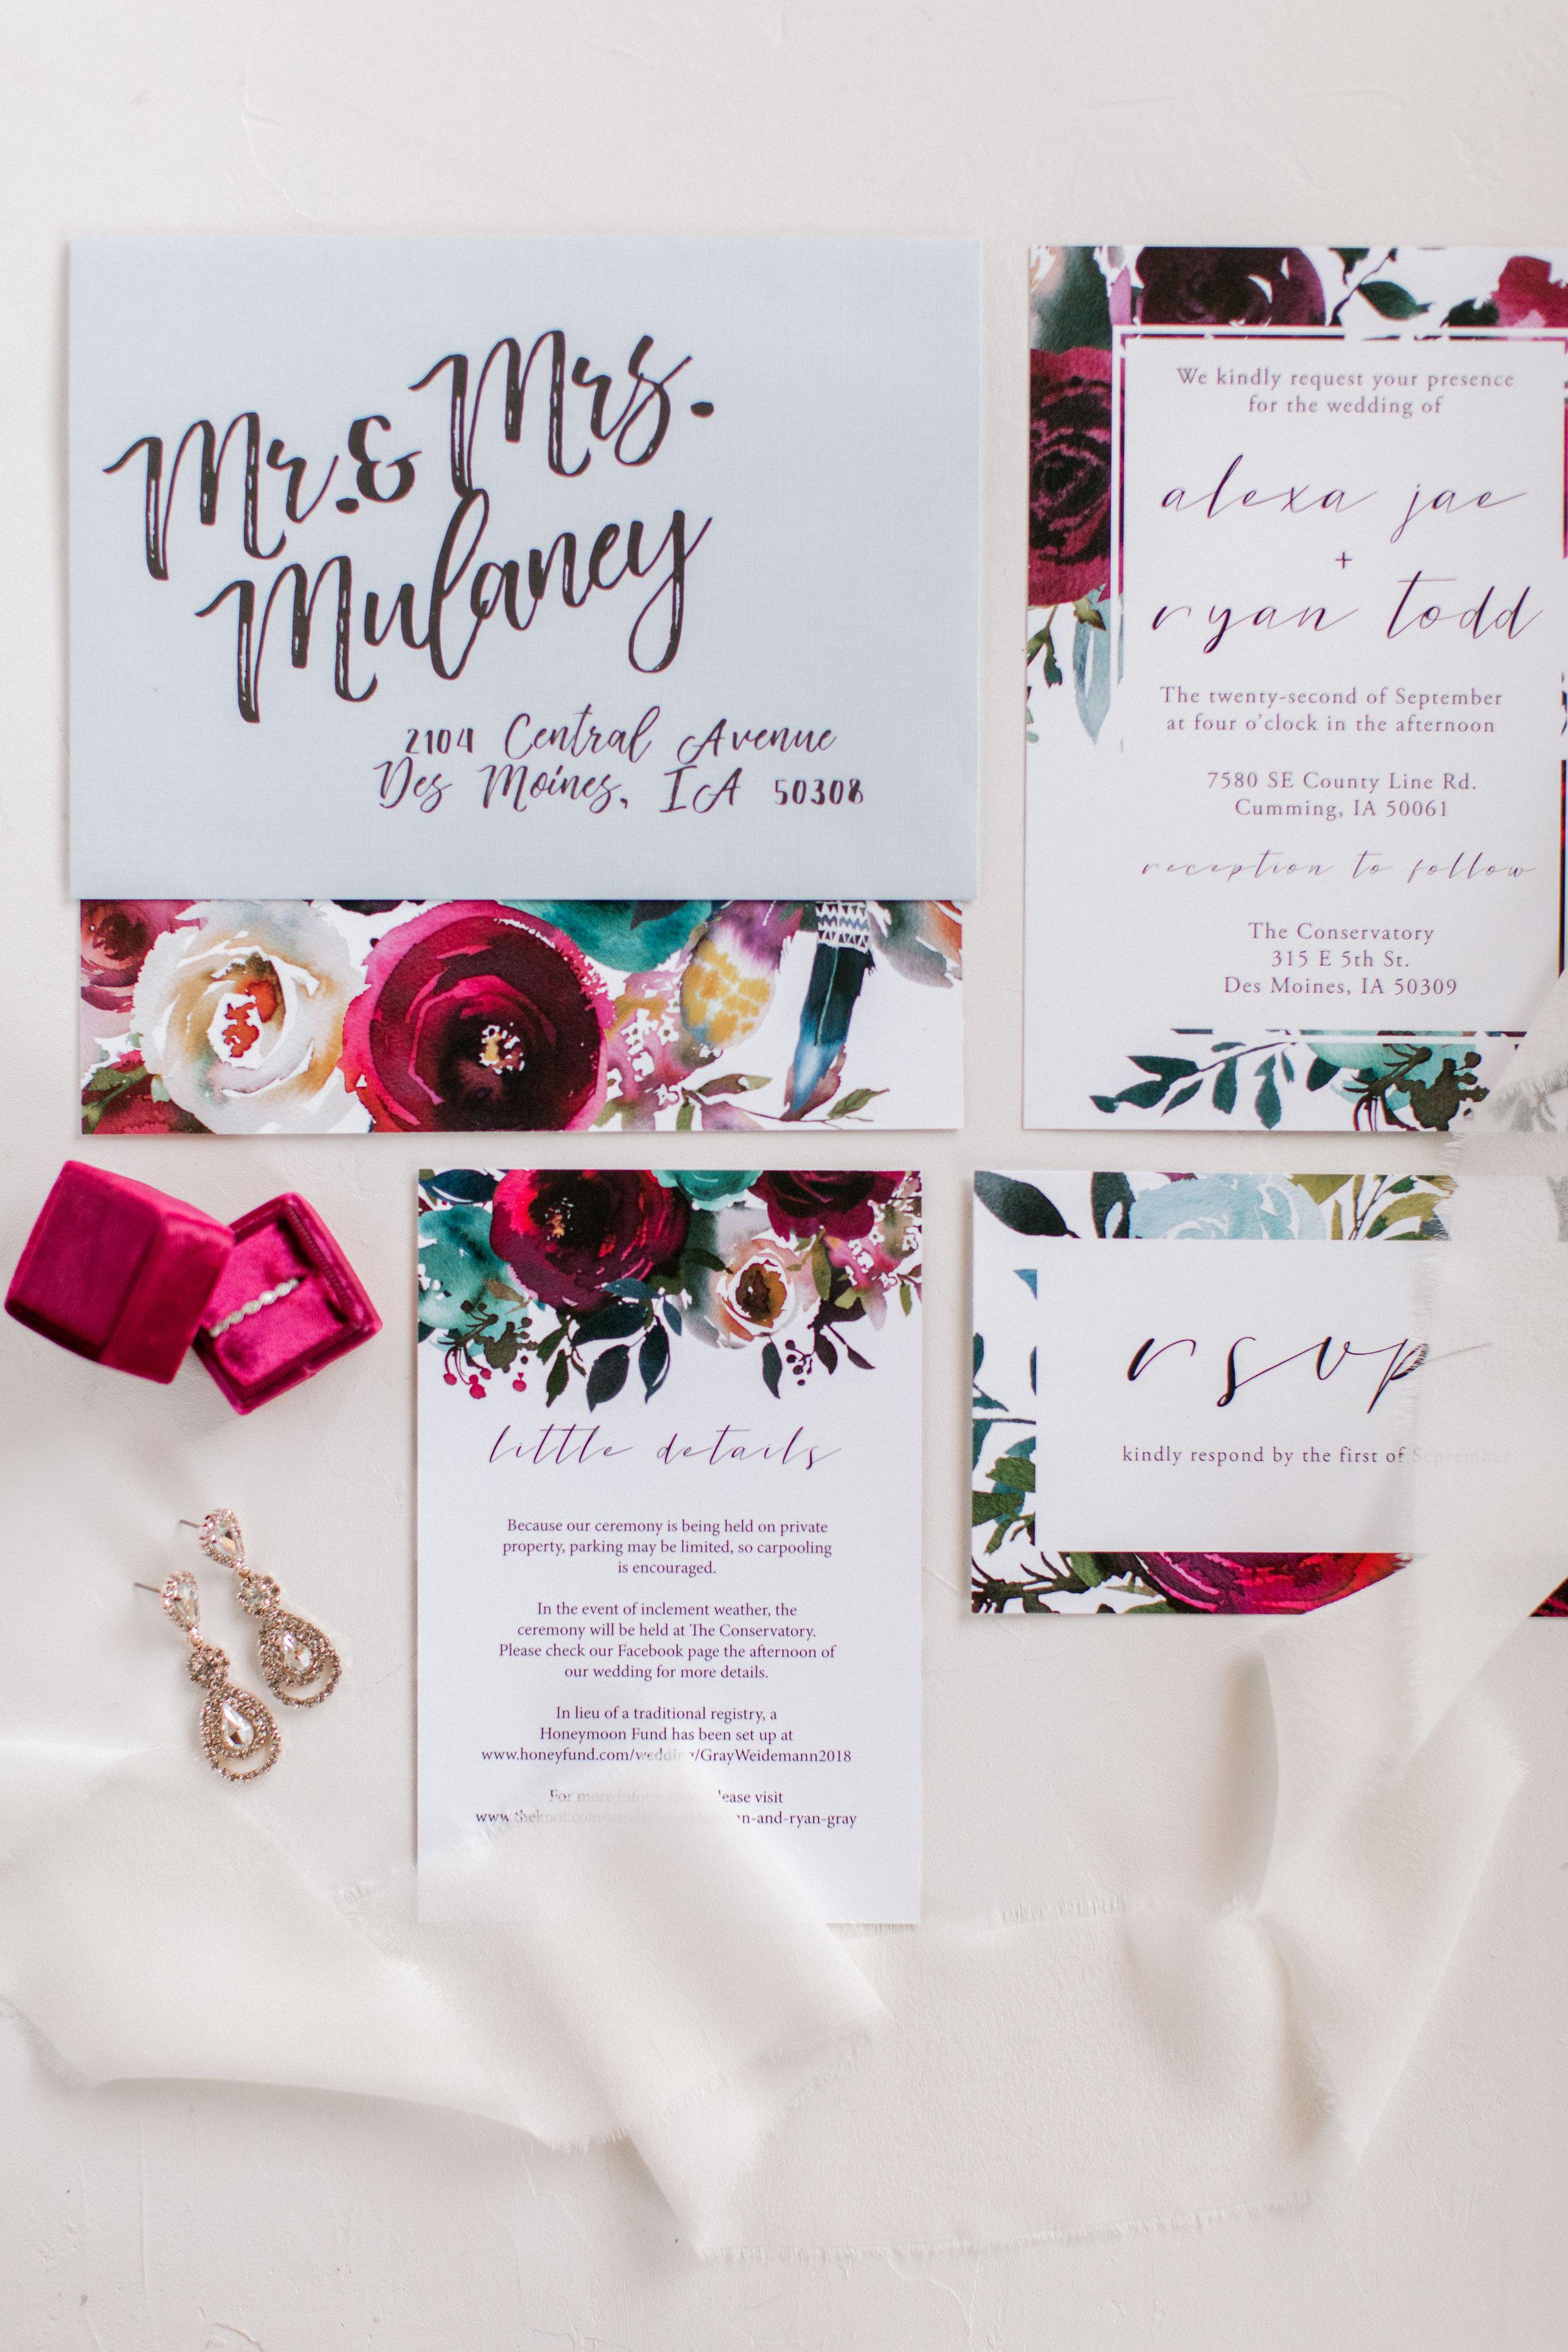 Ryan Alexa Married-Getting Ready First Look-0012.jpg